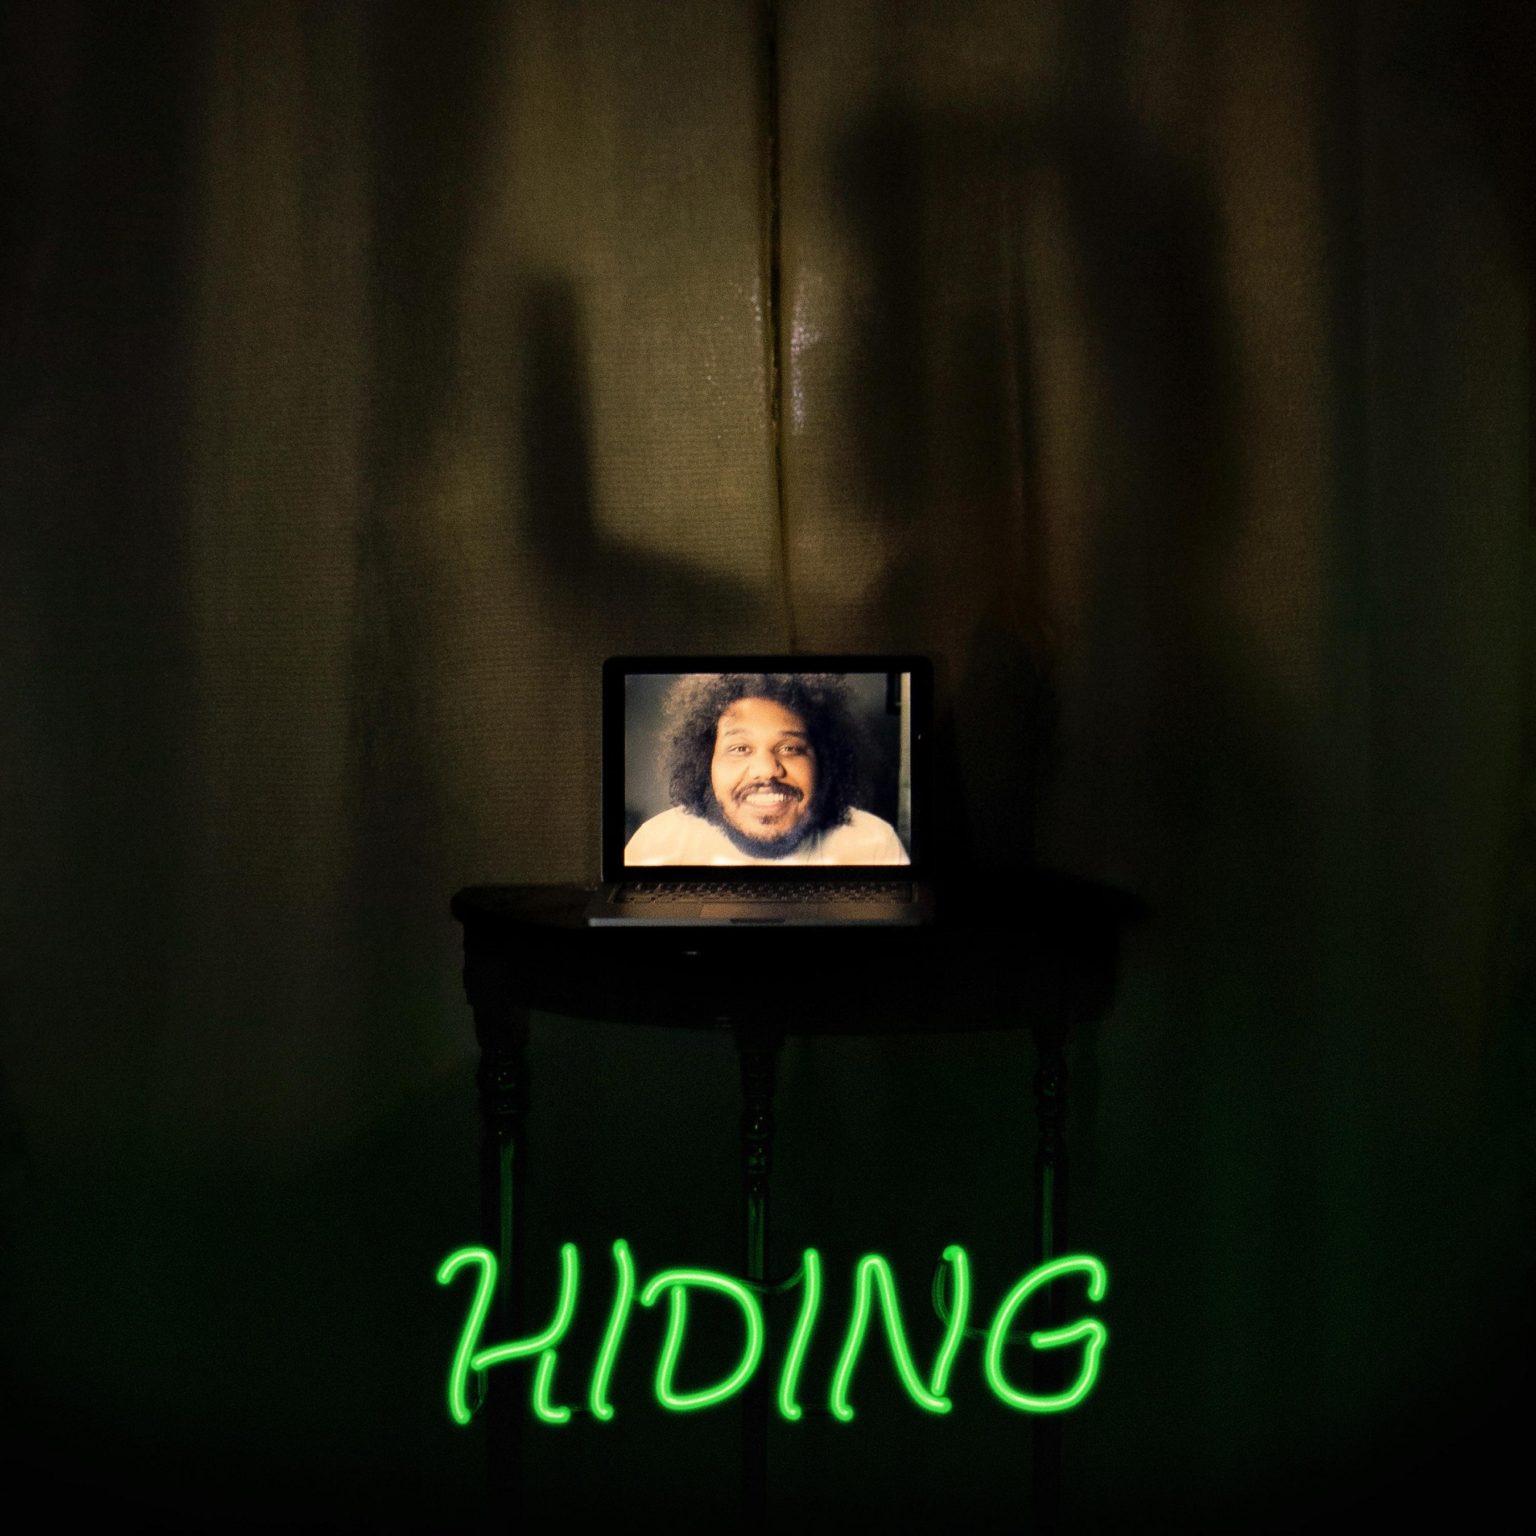 Michael Christmas - Hiding album cover